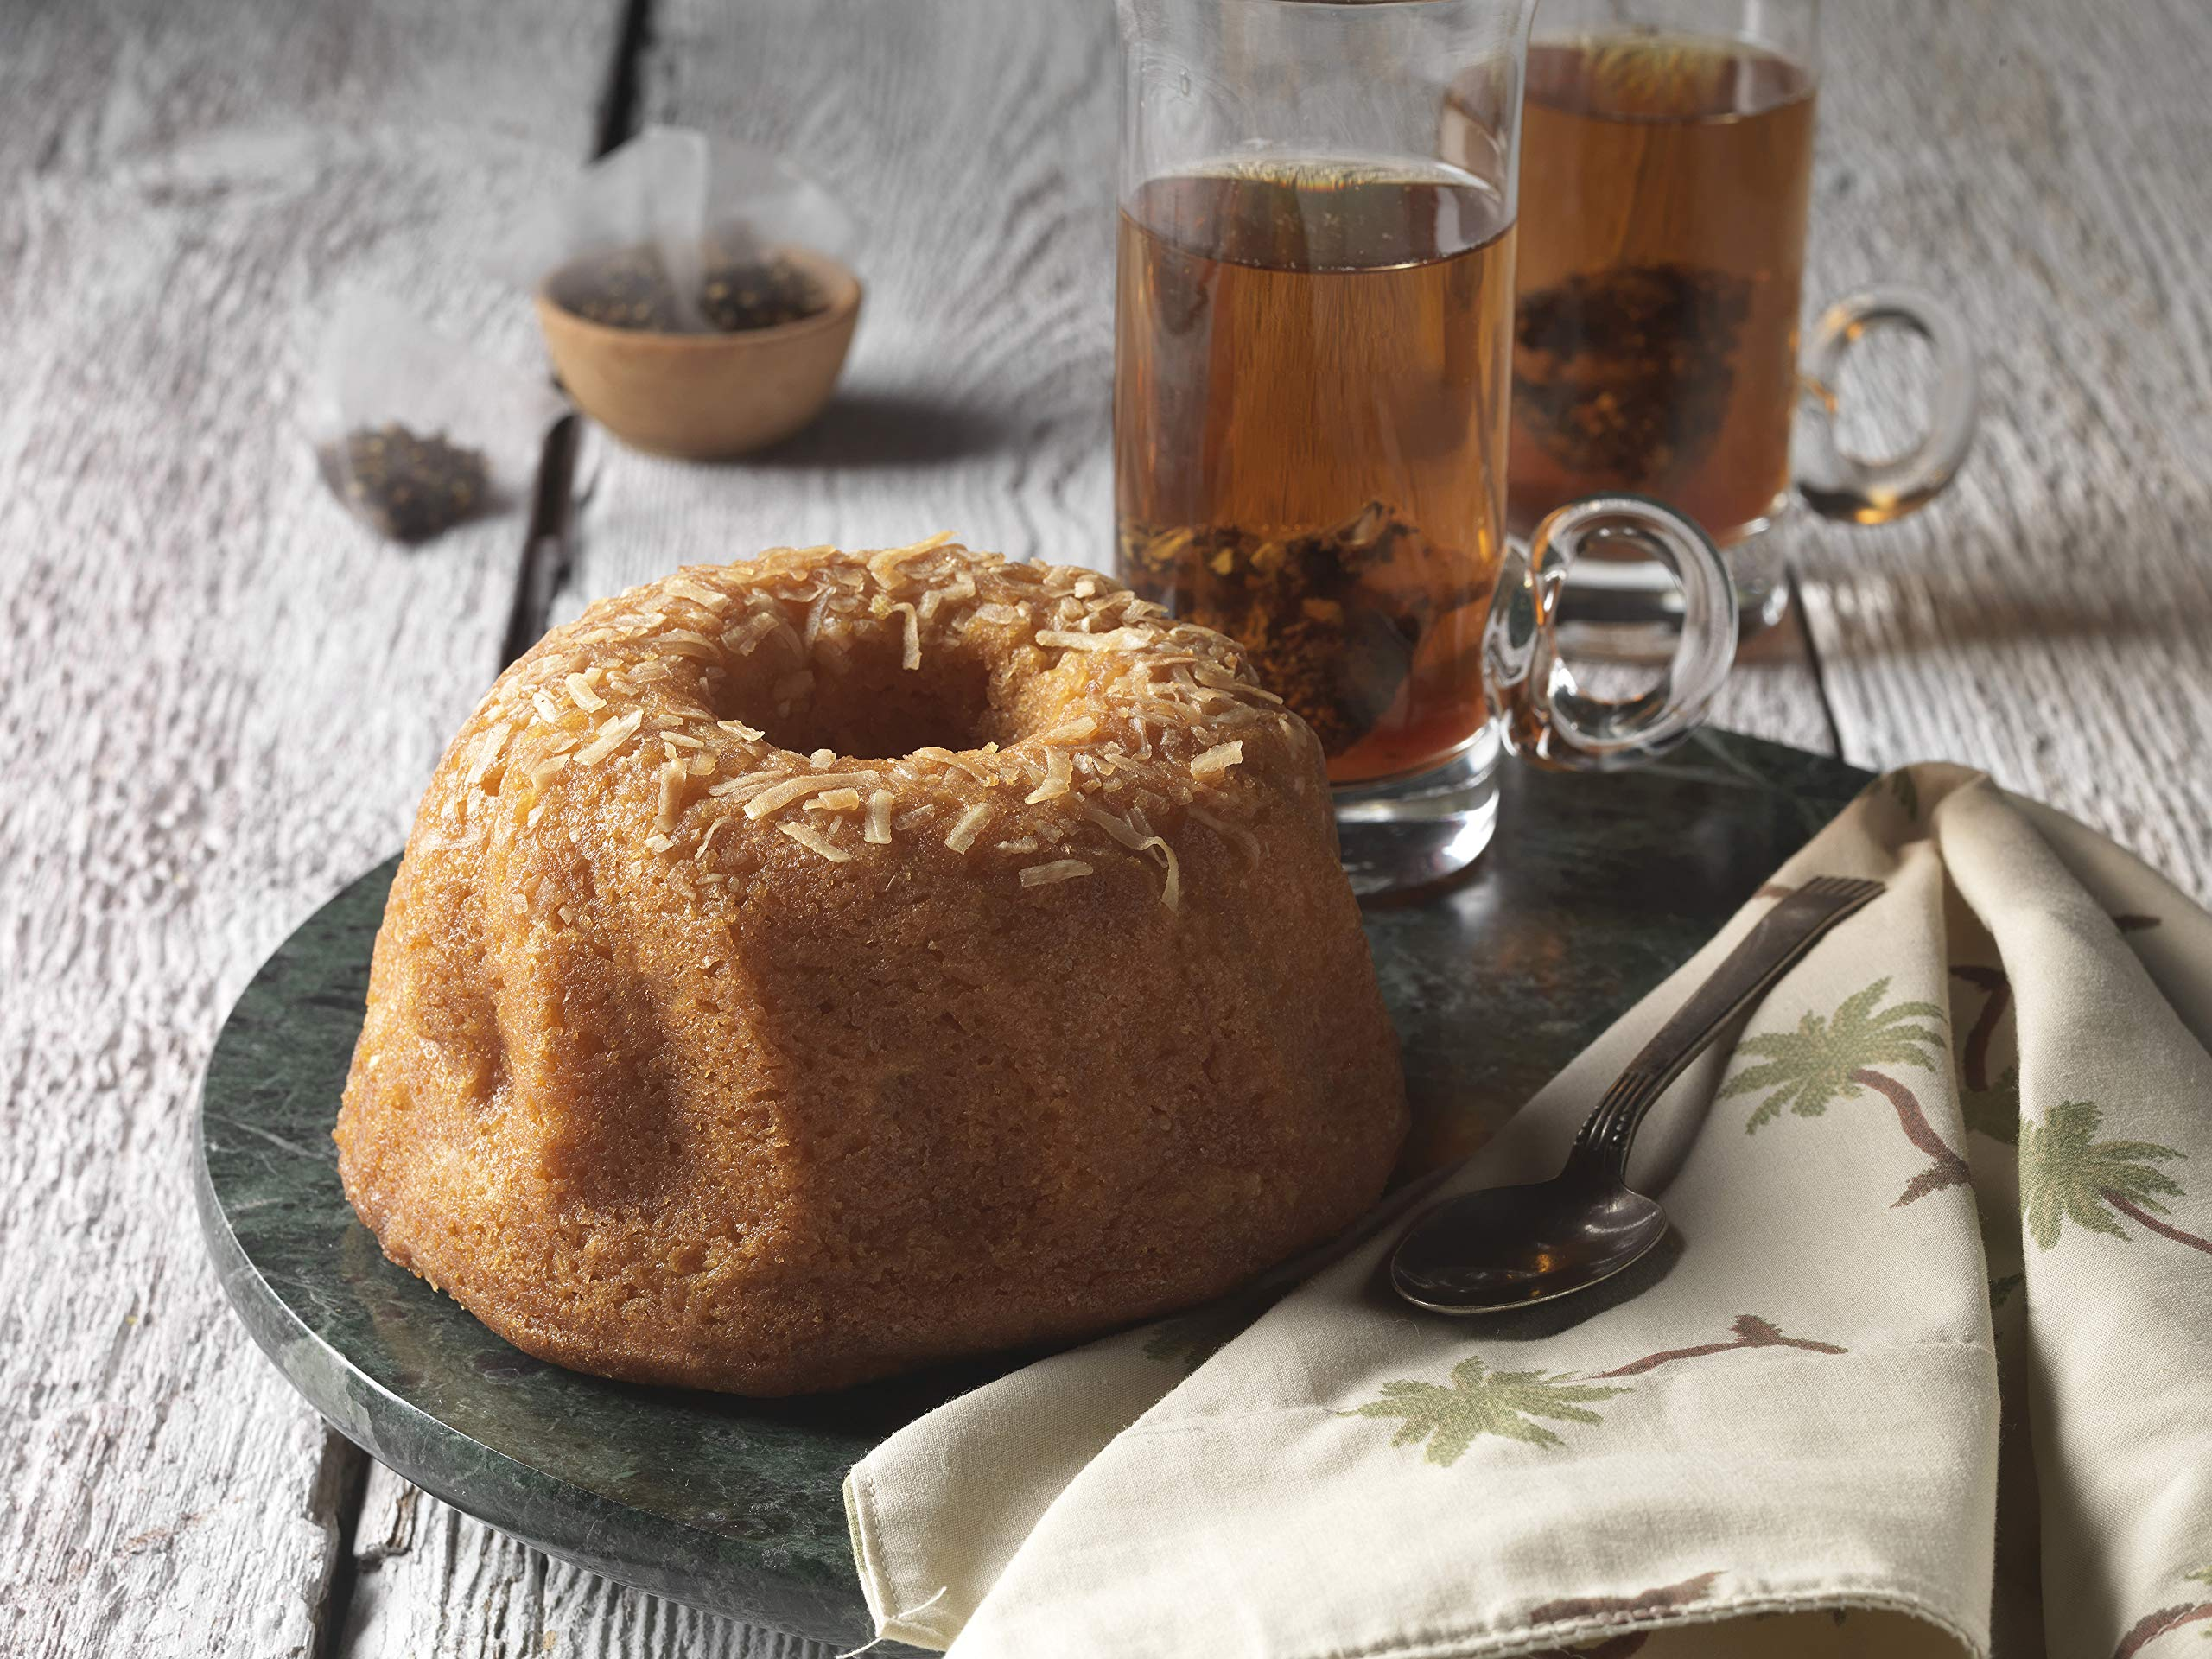 TORTUGA Caribbean Coconut Rum Cake - 4 oz. - The Perfect Premium Gourmet Gifts